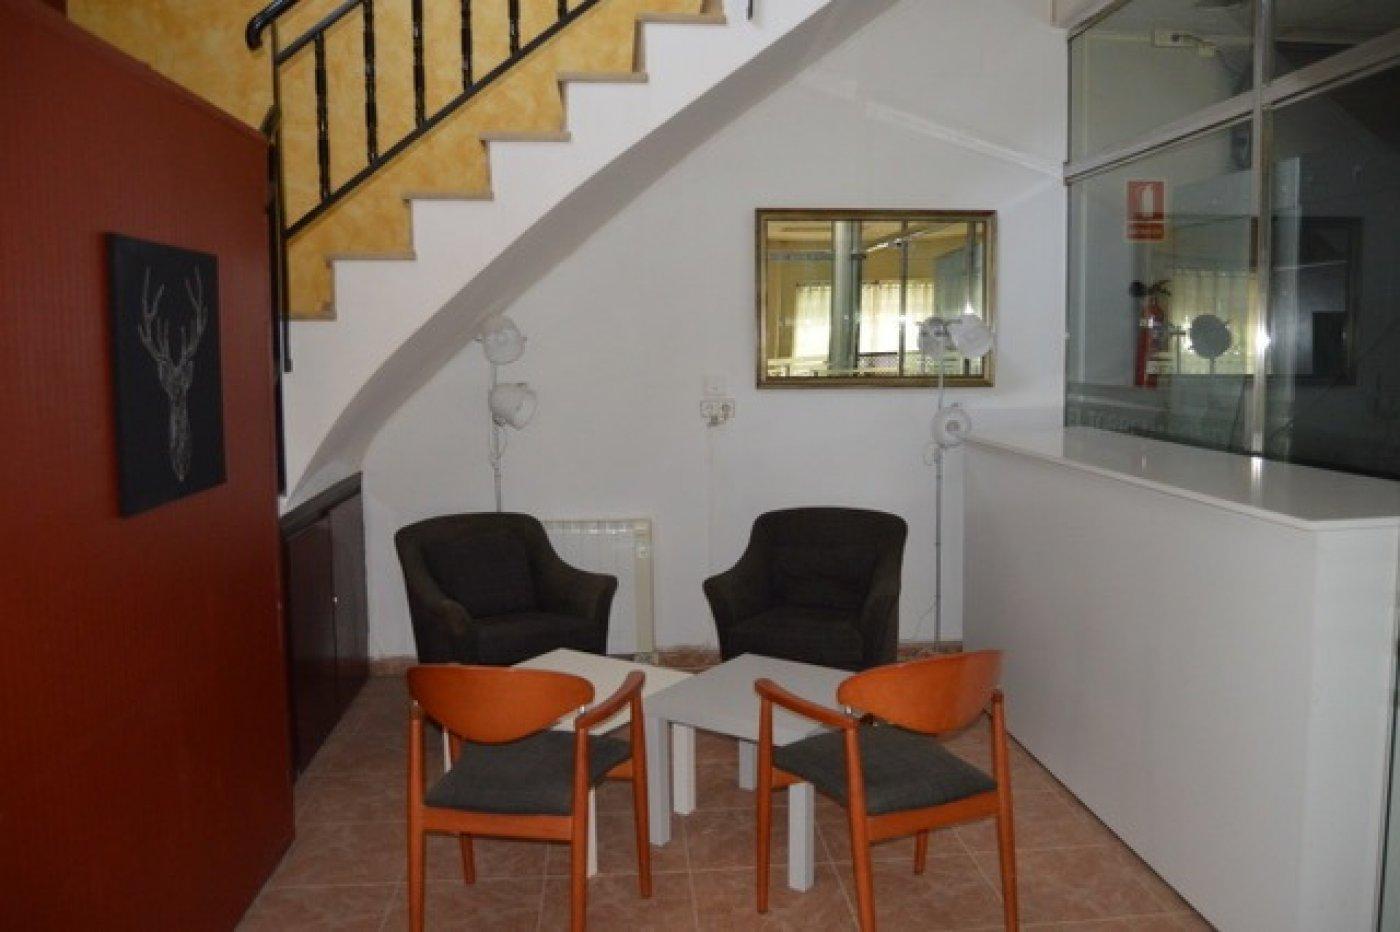 Nave restaurante en polígono cerca de sant sadurní d´anoia - imagenInmueble26